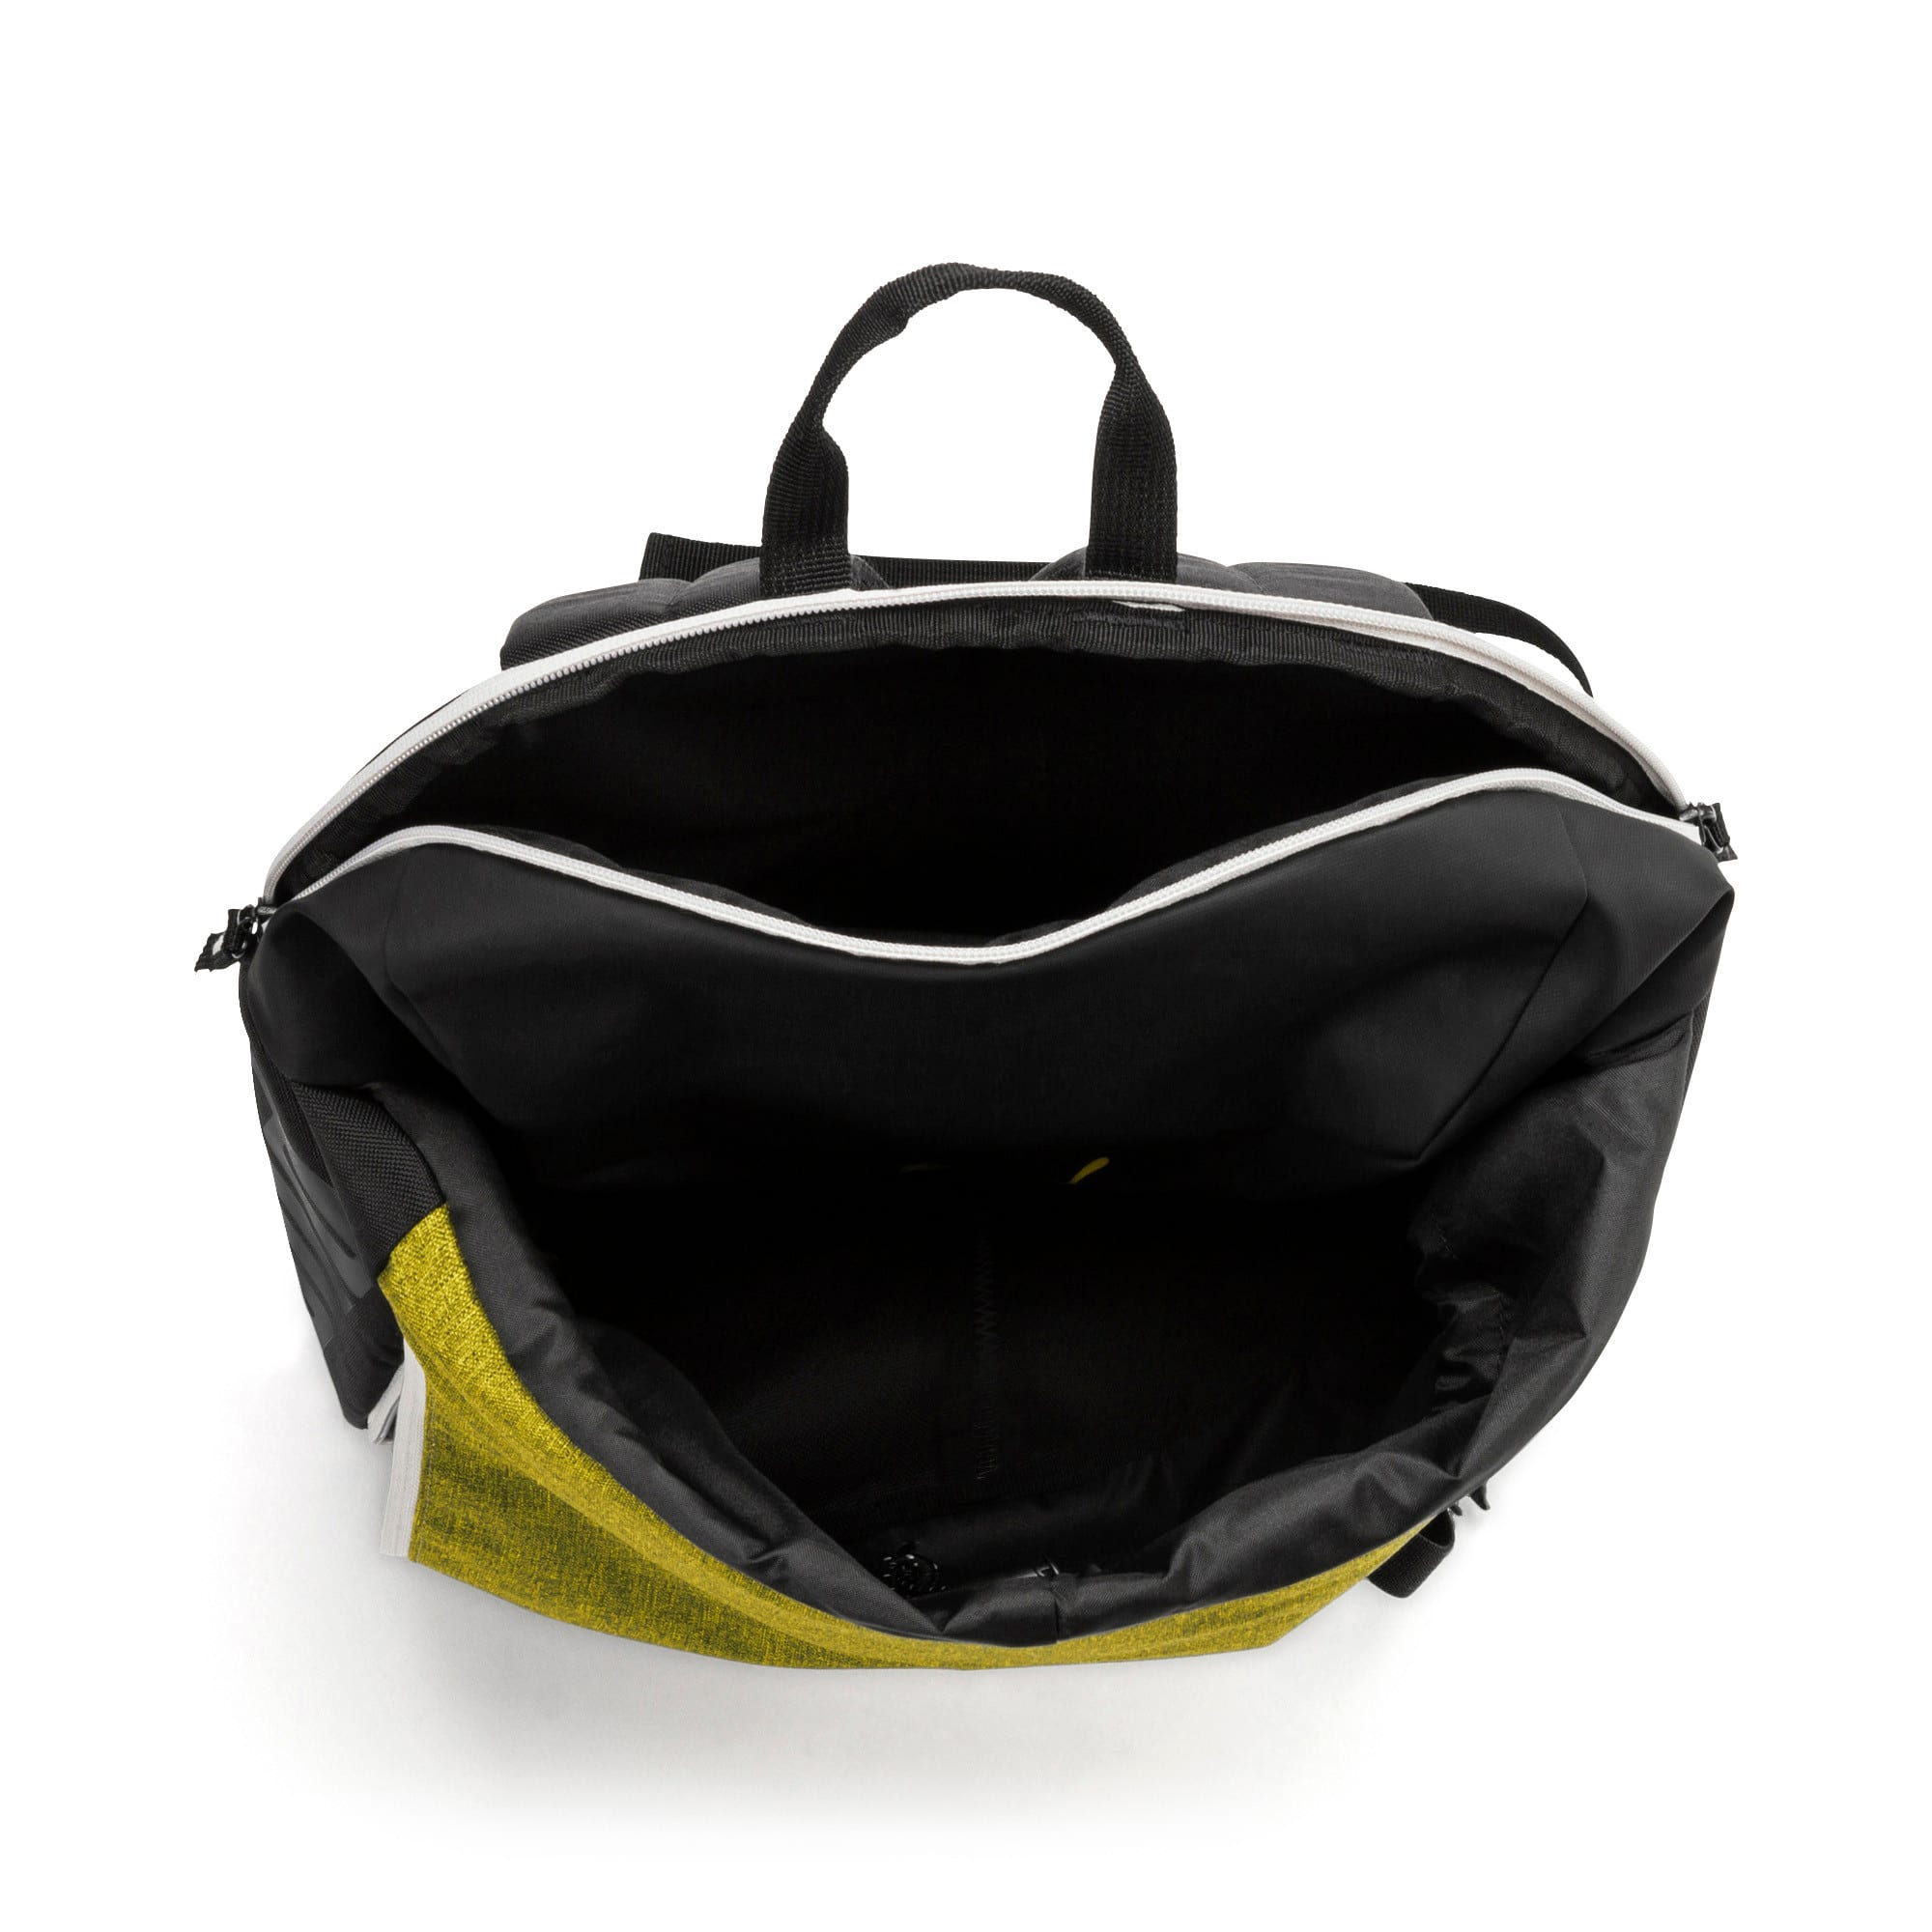 Thumbnail 3 of BVB 365 Backpack, Puma Black-Cyber Yellow, medium-IND